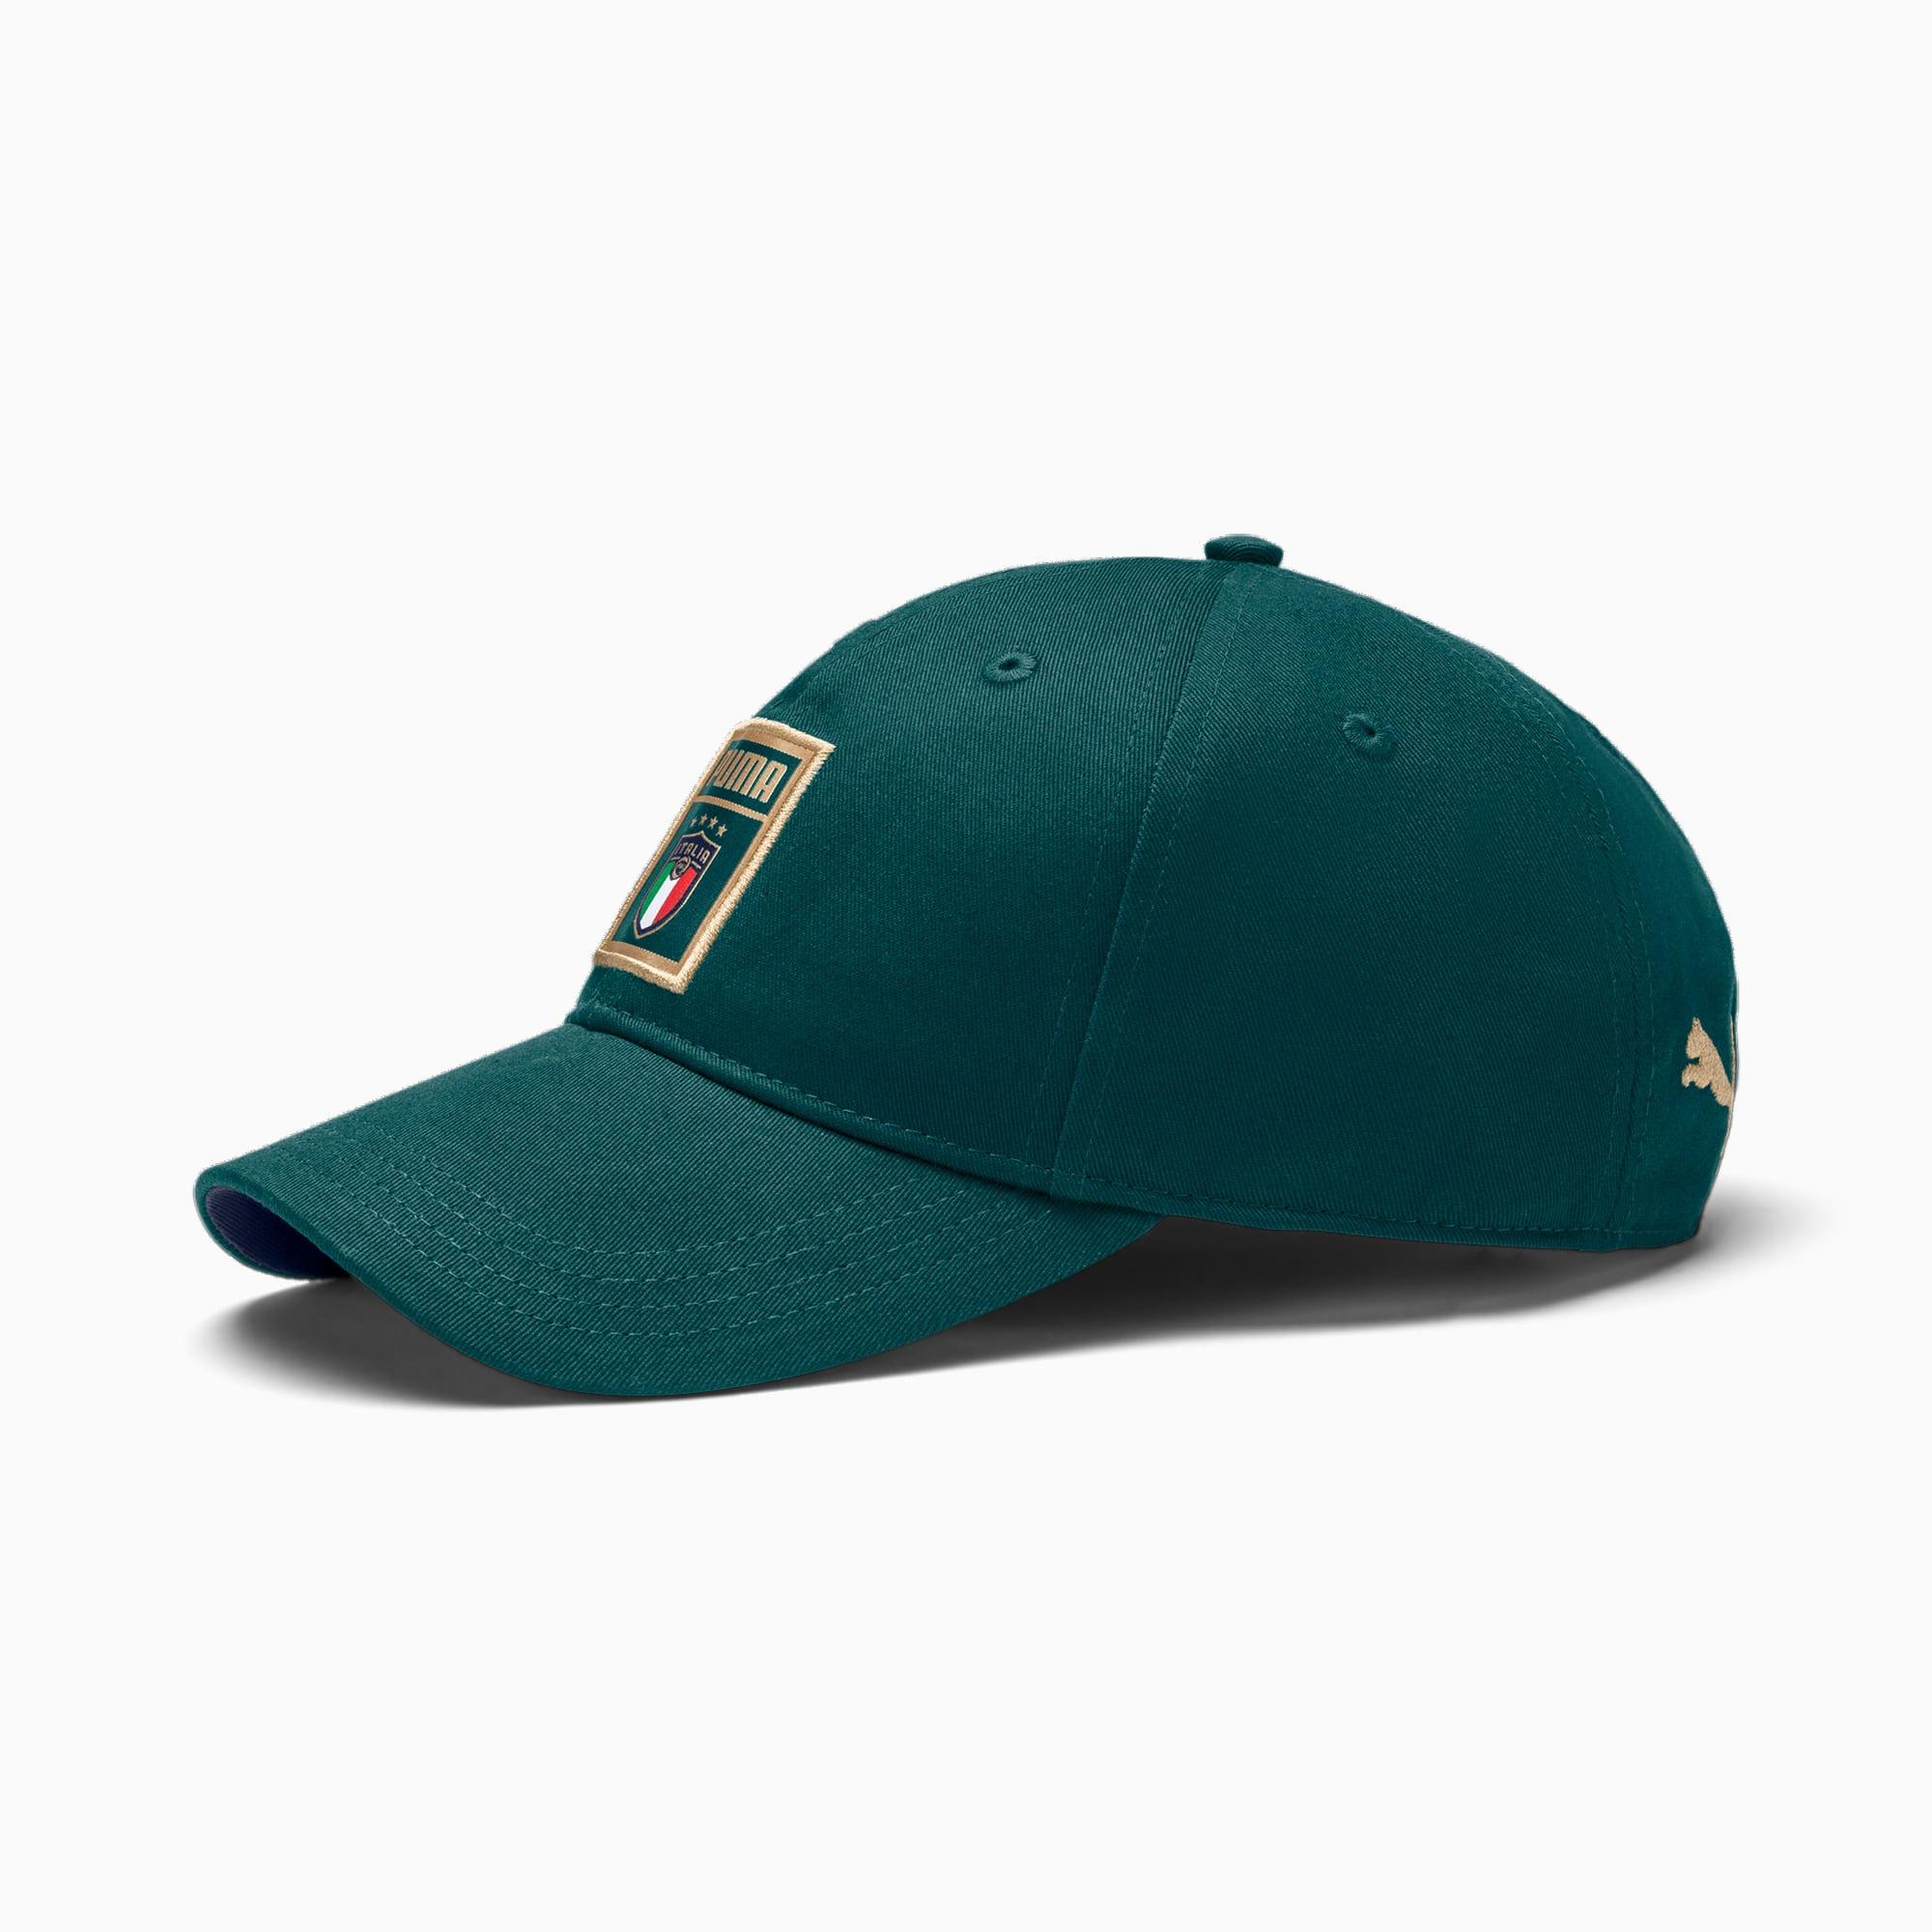 FIGC PUMA DNA Baseball Cap